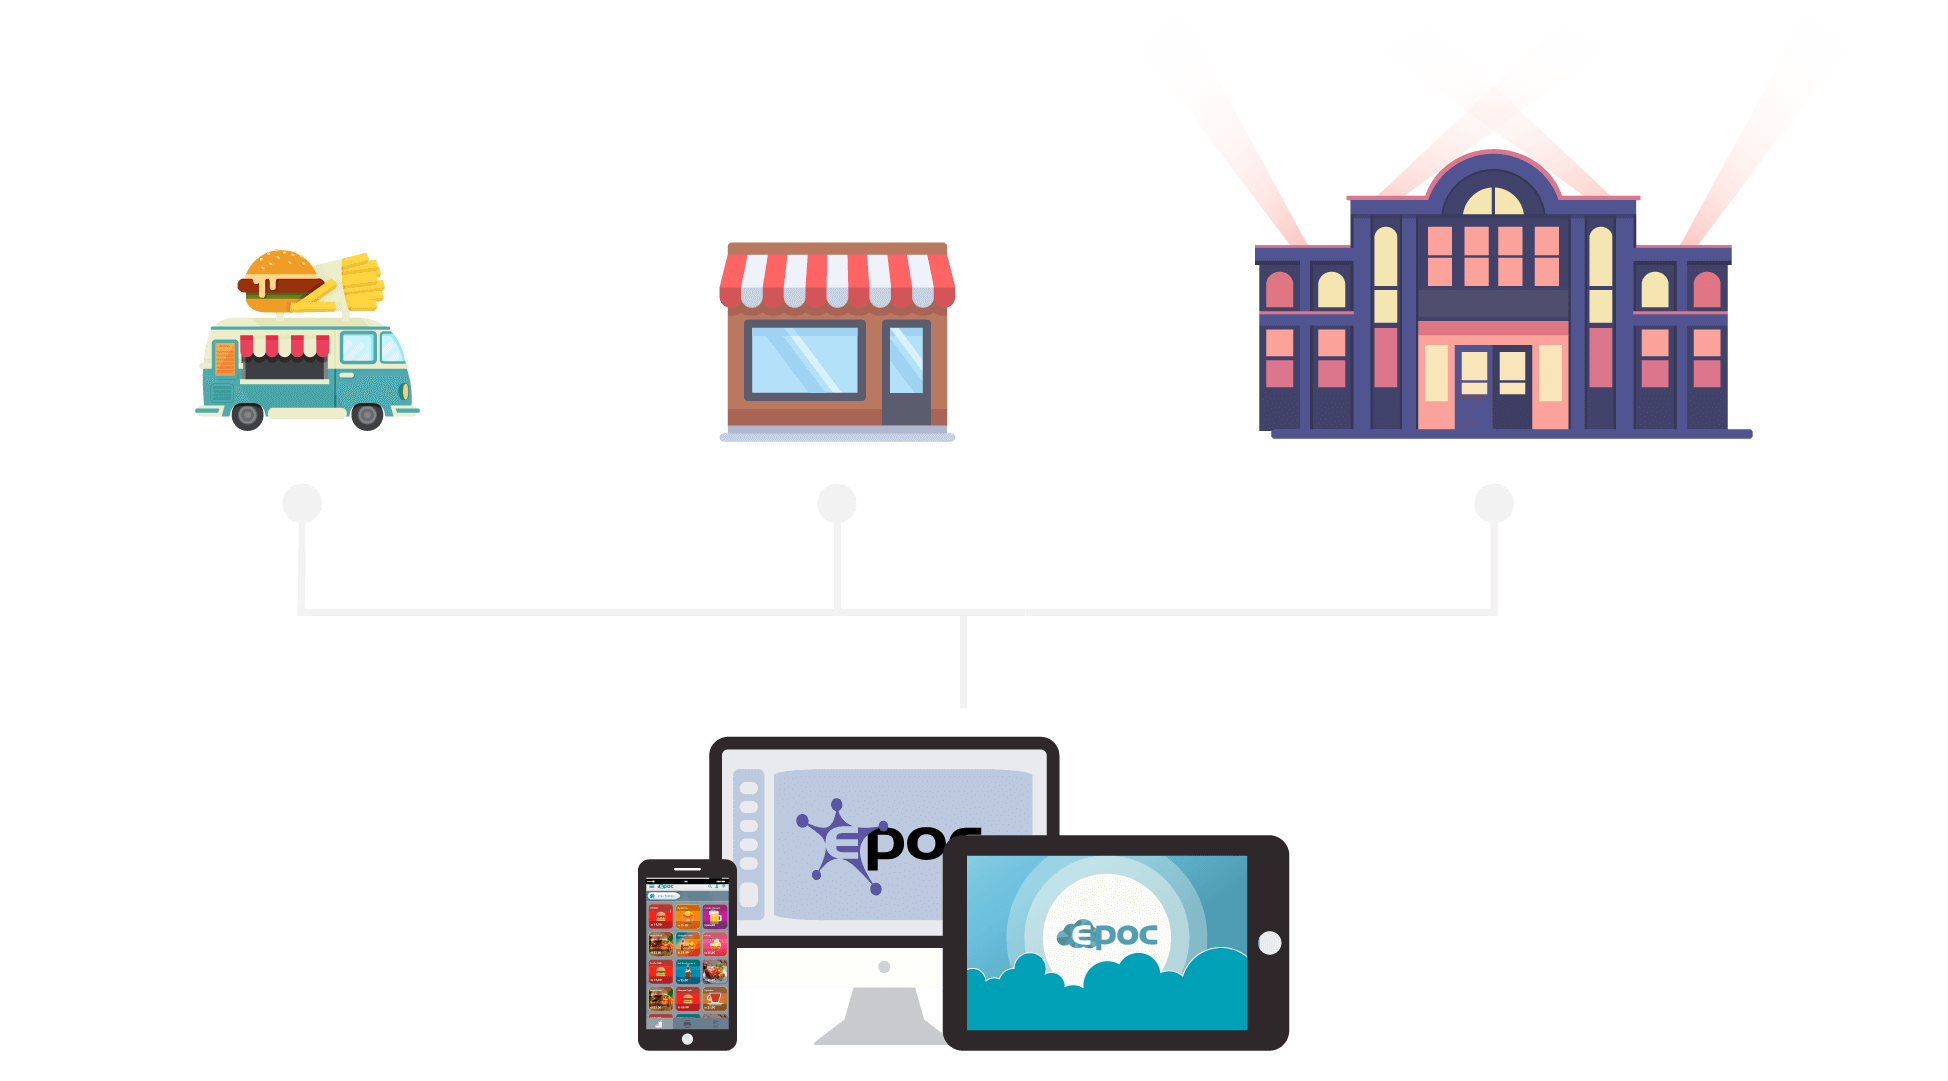 epoc_sistema_vendas_gestao_adminsitracao_micro_pequenos_medios_grandes_negocios_comercios